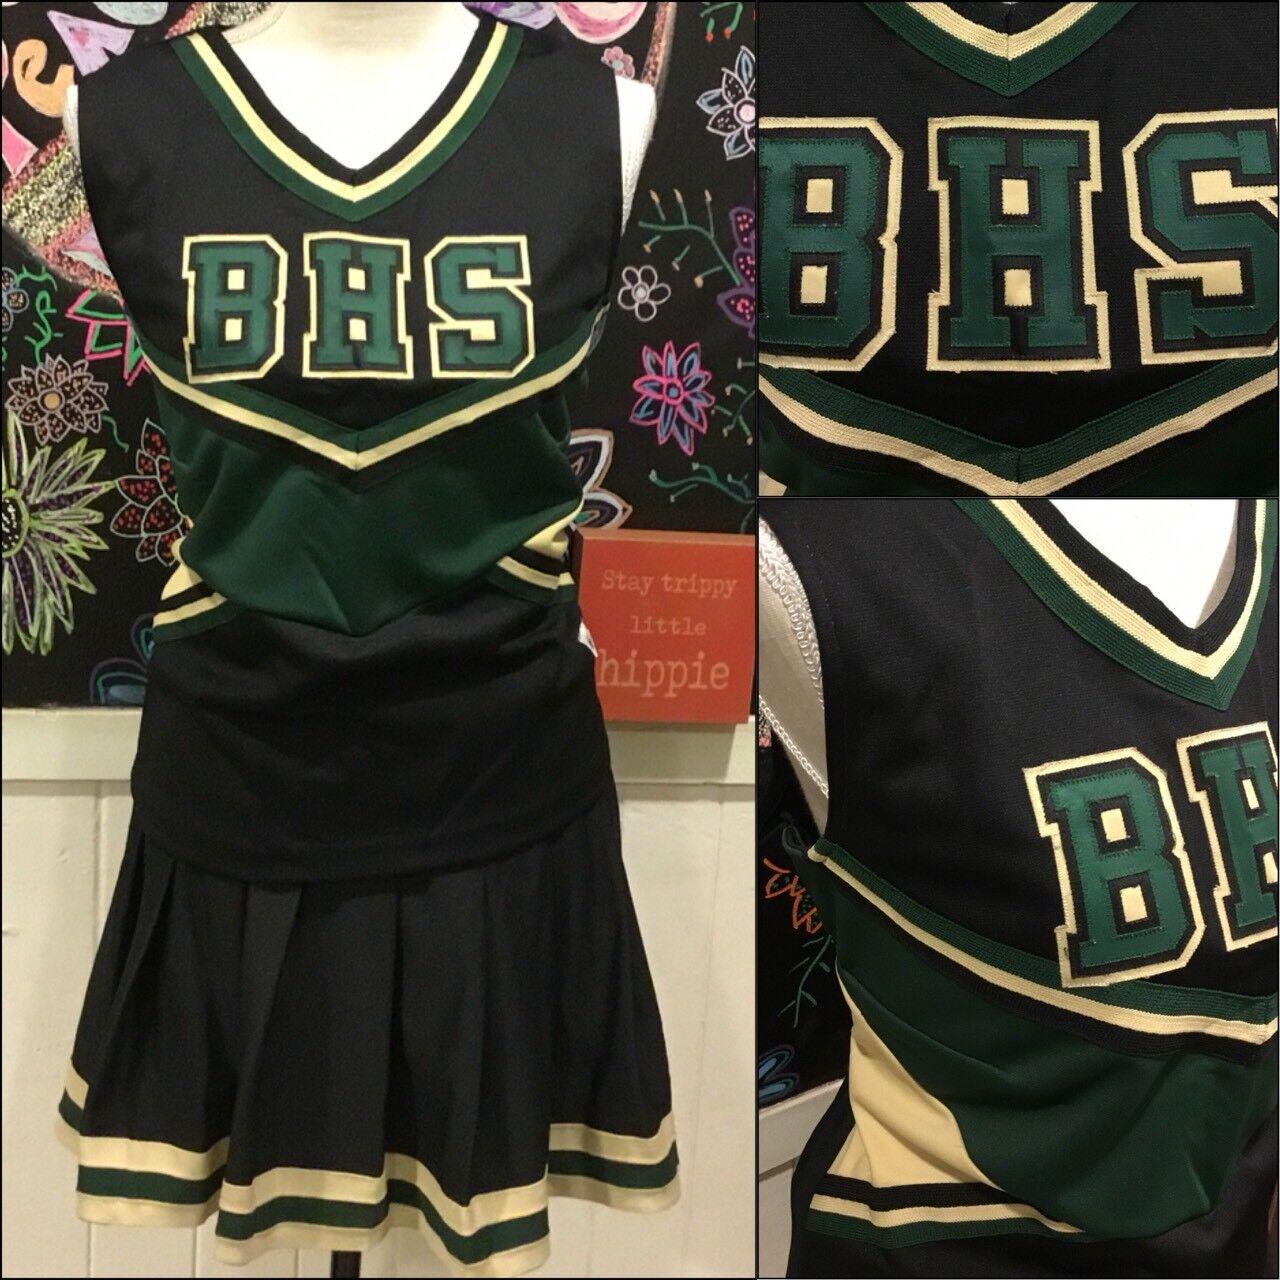 BHS Real Cheerleading Uniform Youth L Adult  Sm  fashion mall